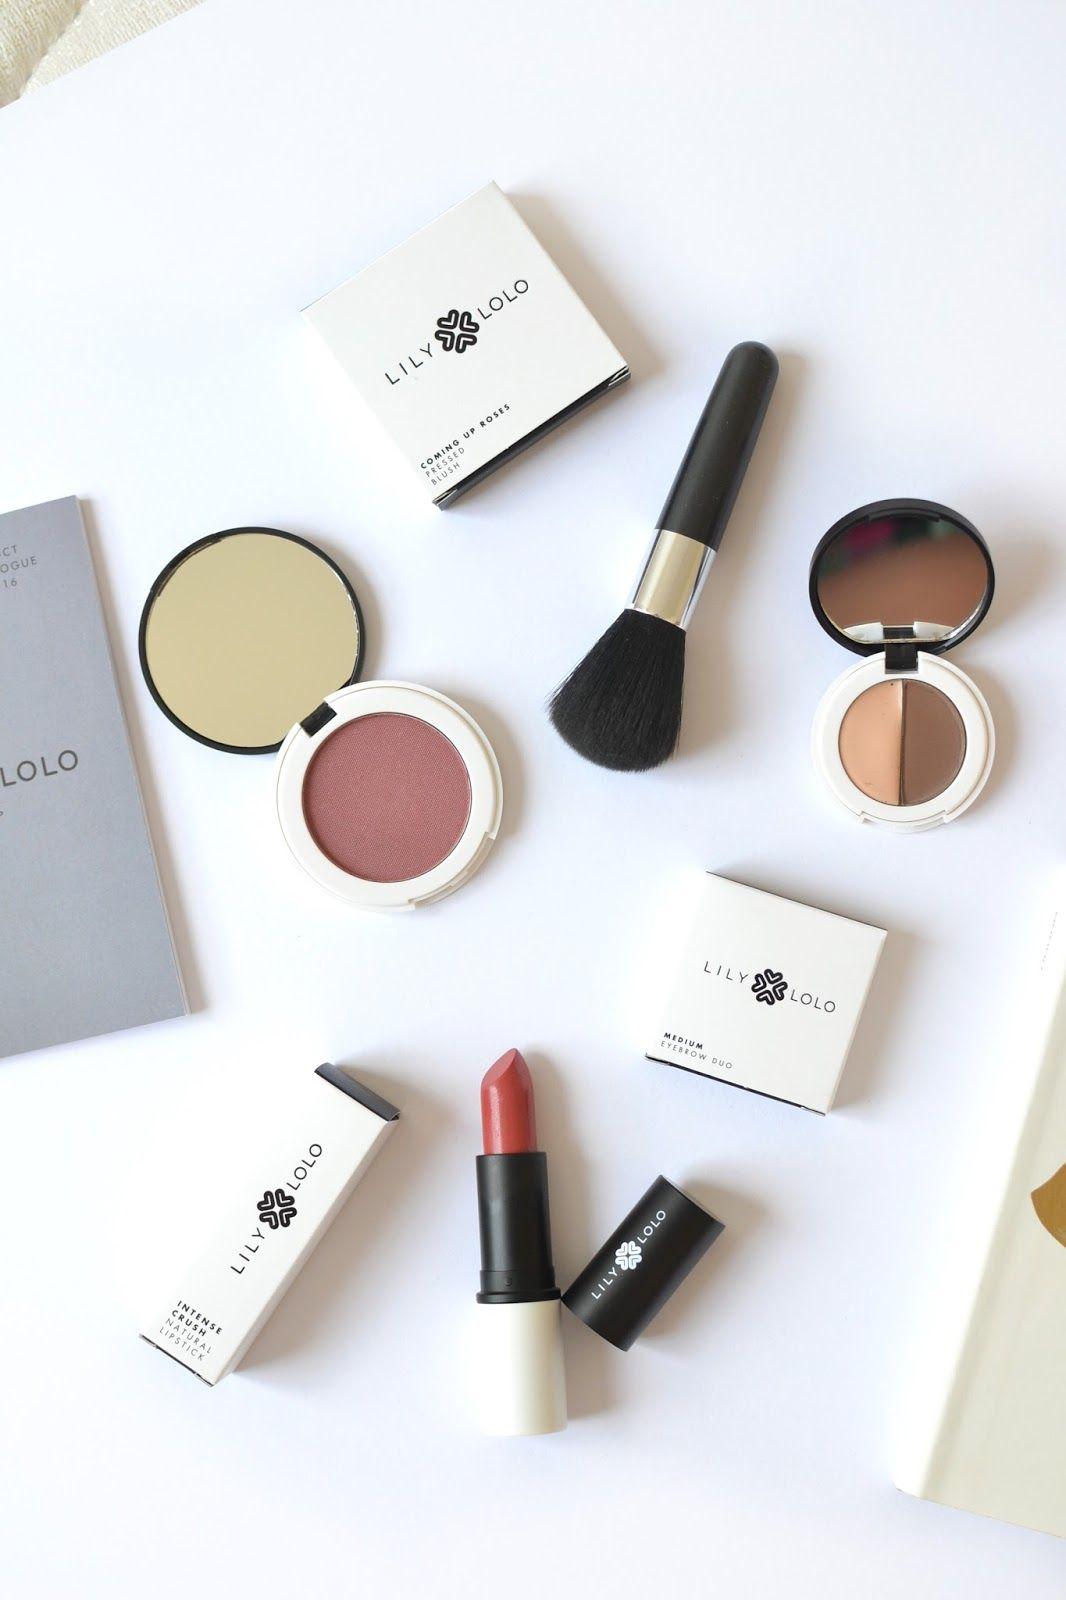 British Beauty Brand | Lily Lolo - Temporary:Secretary Lifestyle Blog